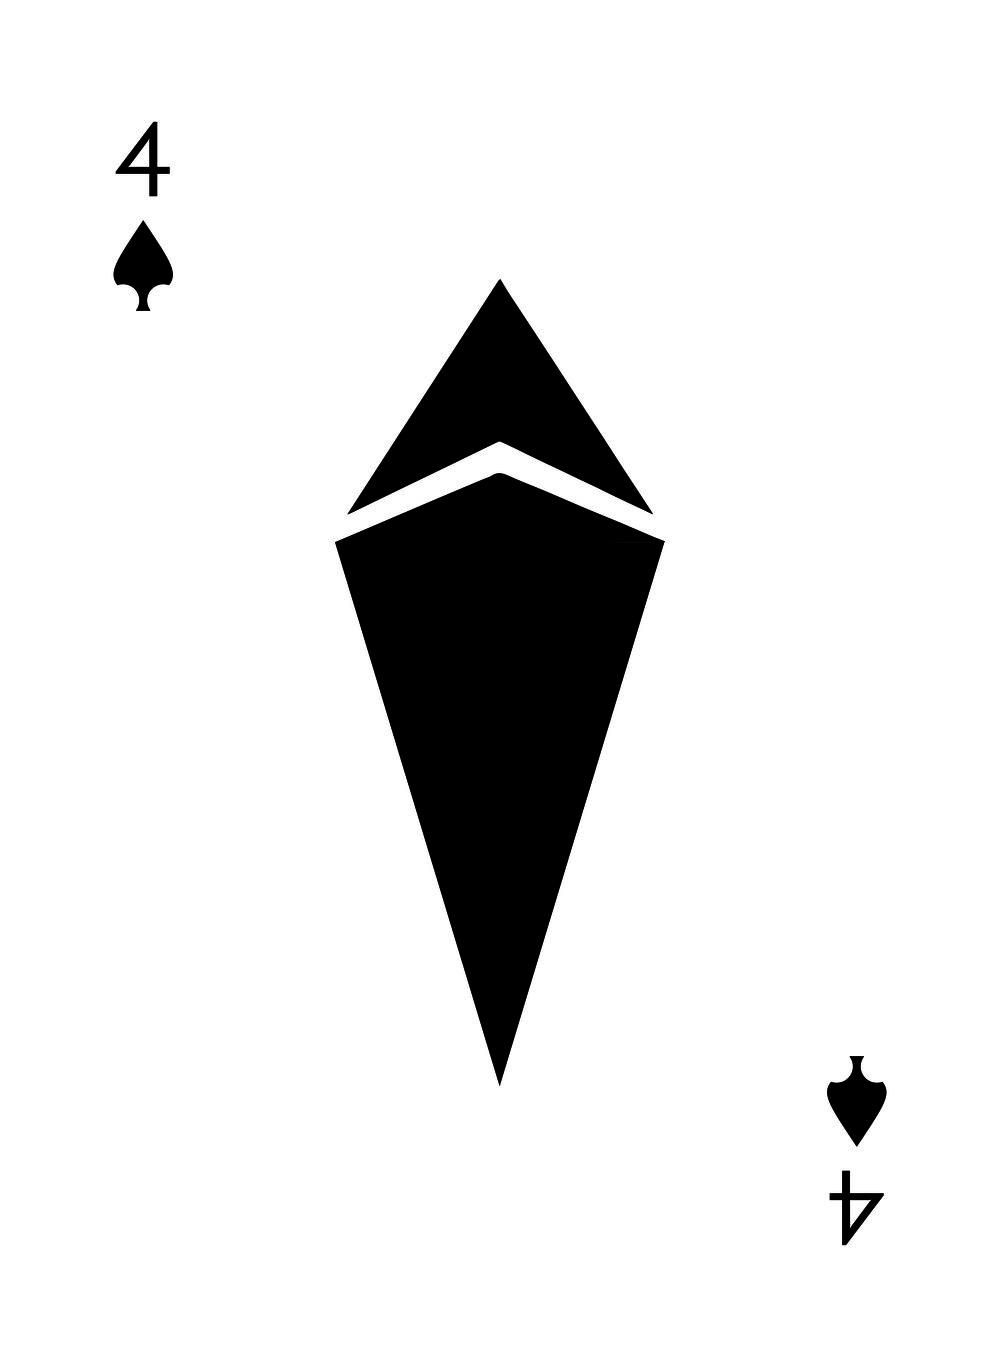 52_2__0009_Spades_4.jpg